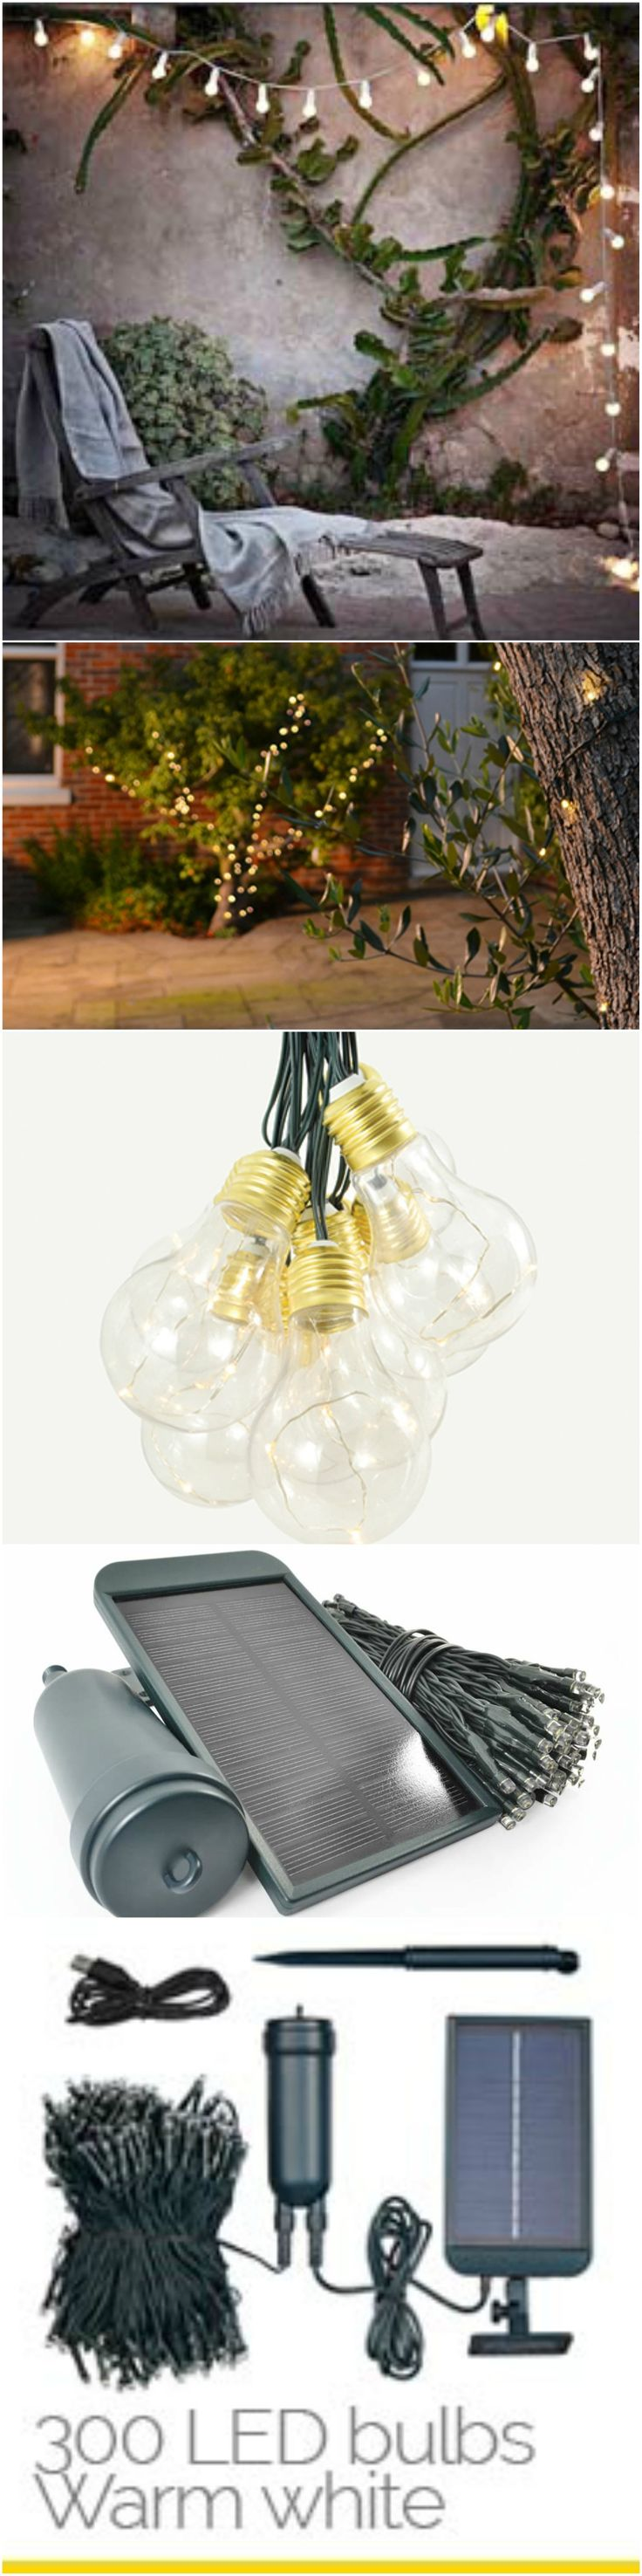 28 best solar lighting images on pinterest solar lights outdoor